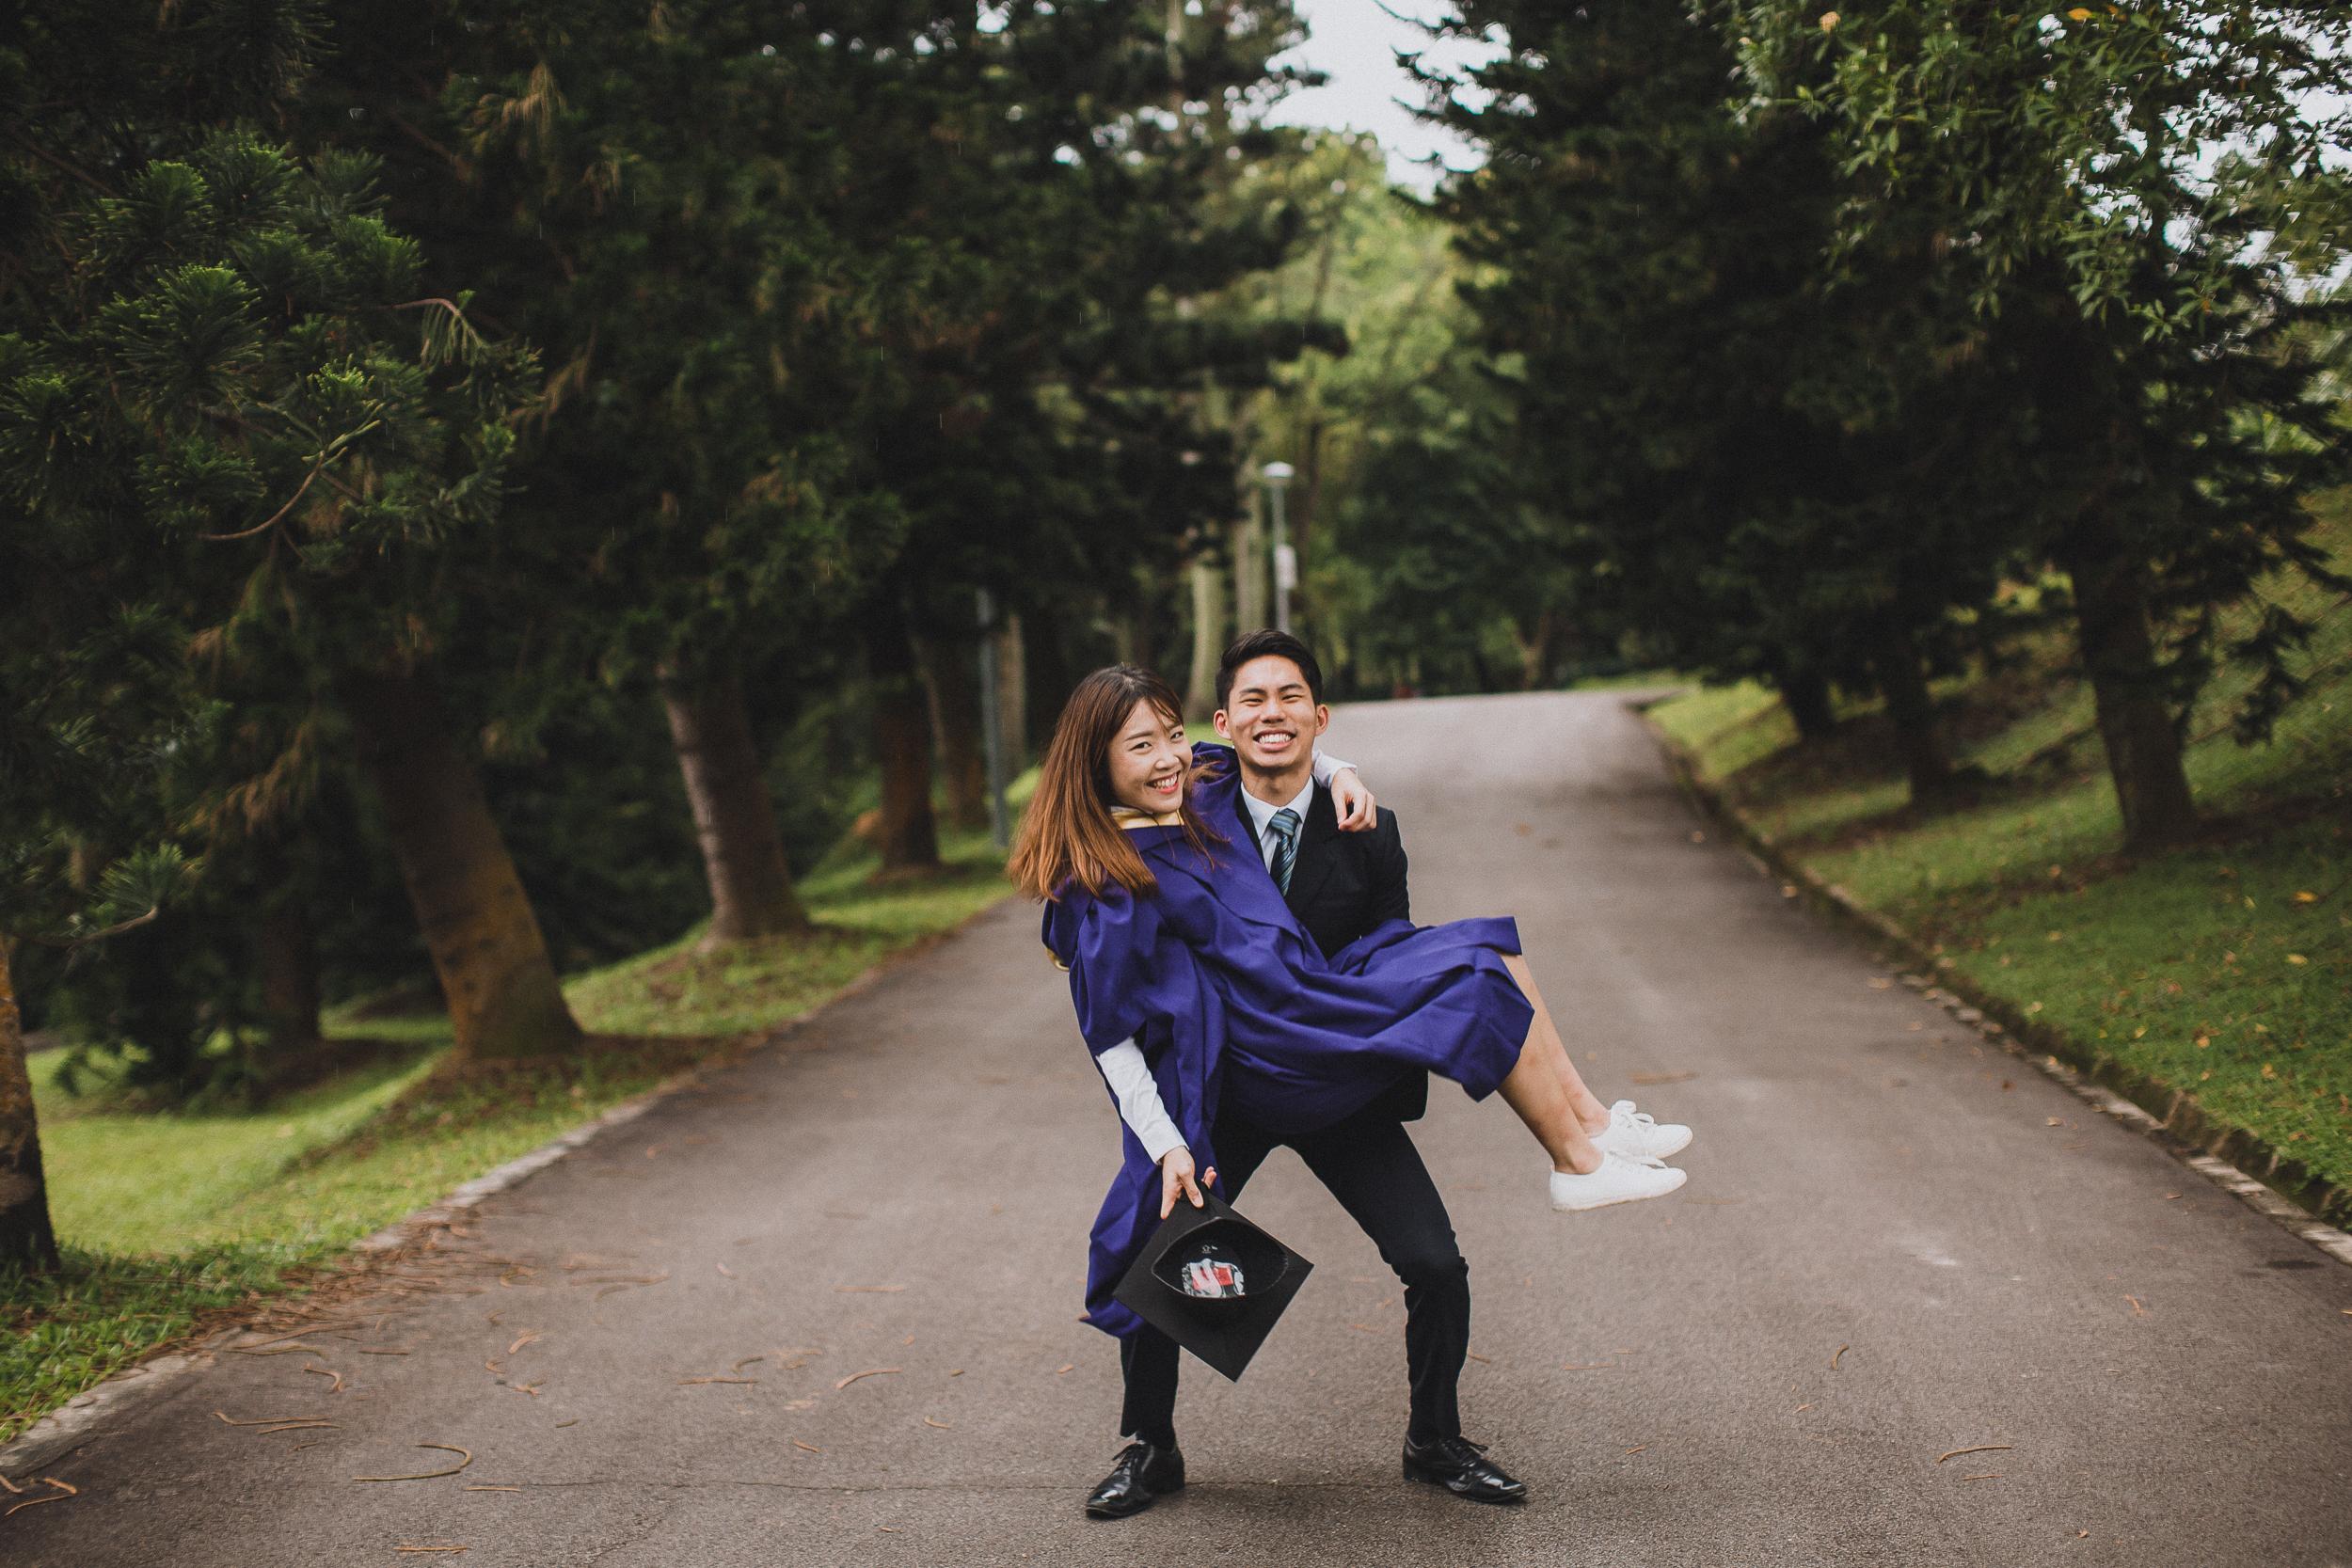 Singapore+Wedding+Photographer+Pre-Wedding+Couple+Zhiyu+Huimin-0050.jpg